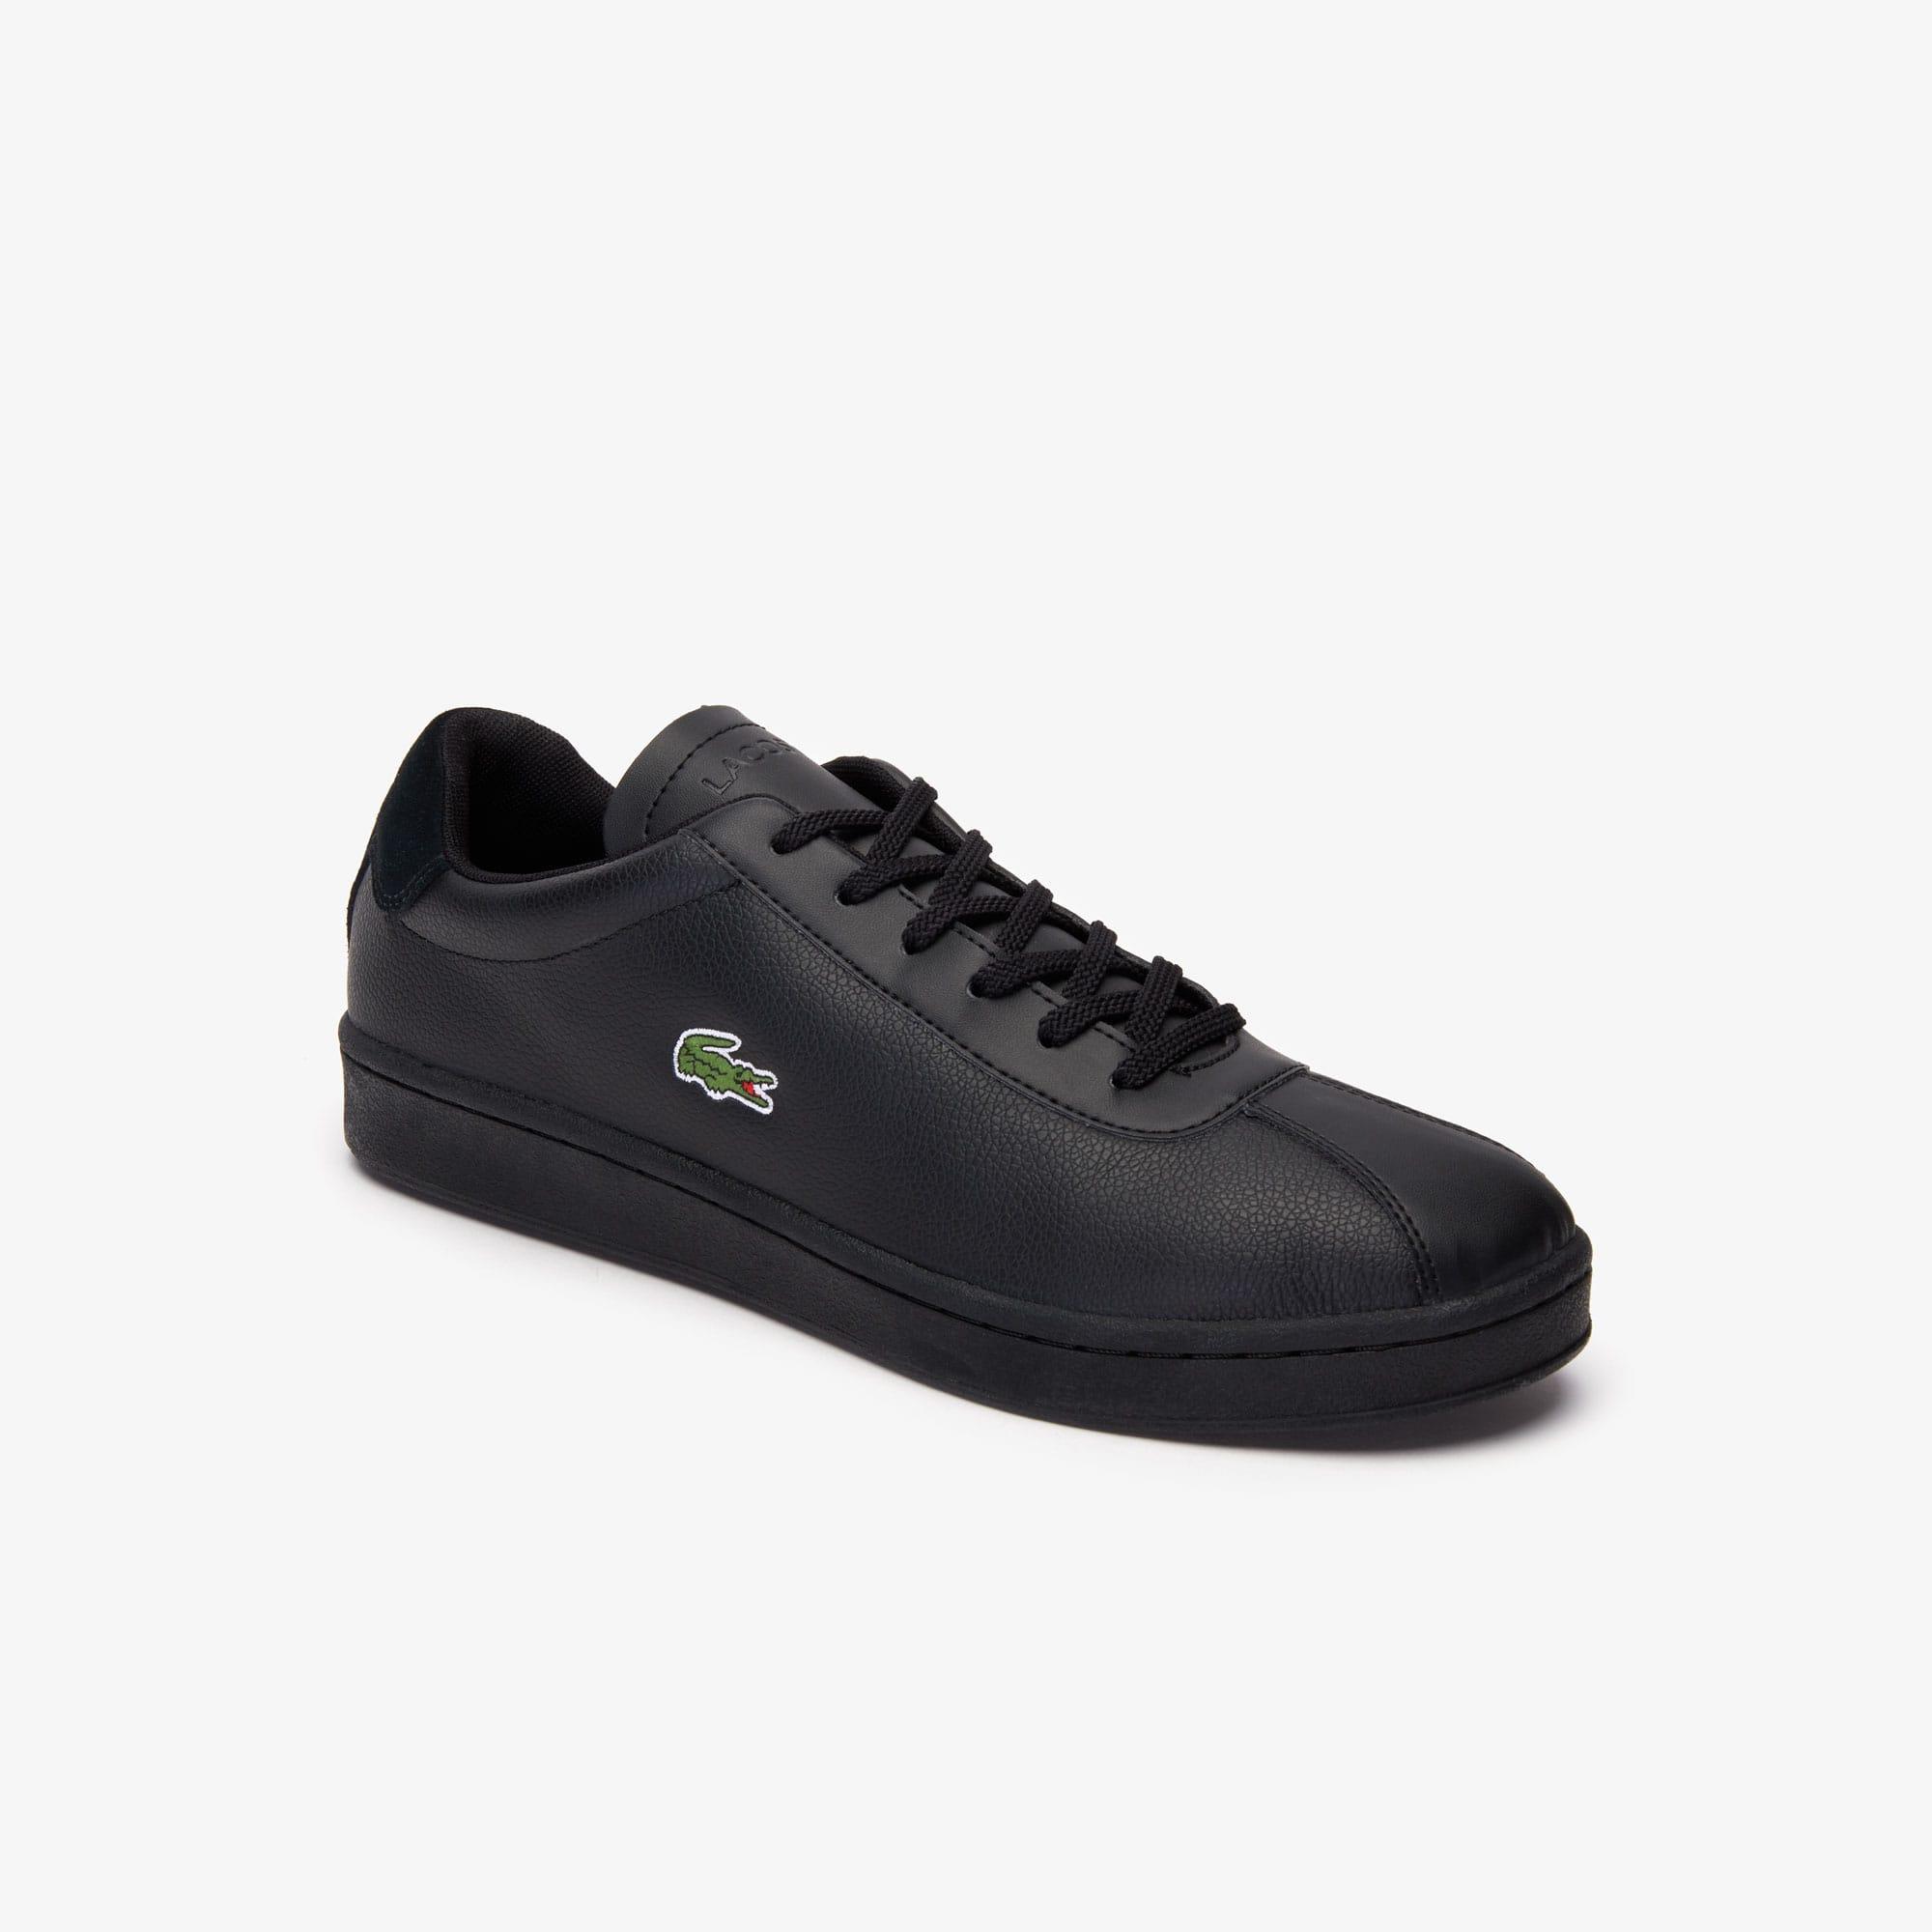 new product 605d4 f237a Herren-Sneakers MASTERS aus gewalktem Leder und Synthetik